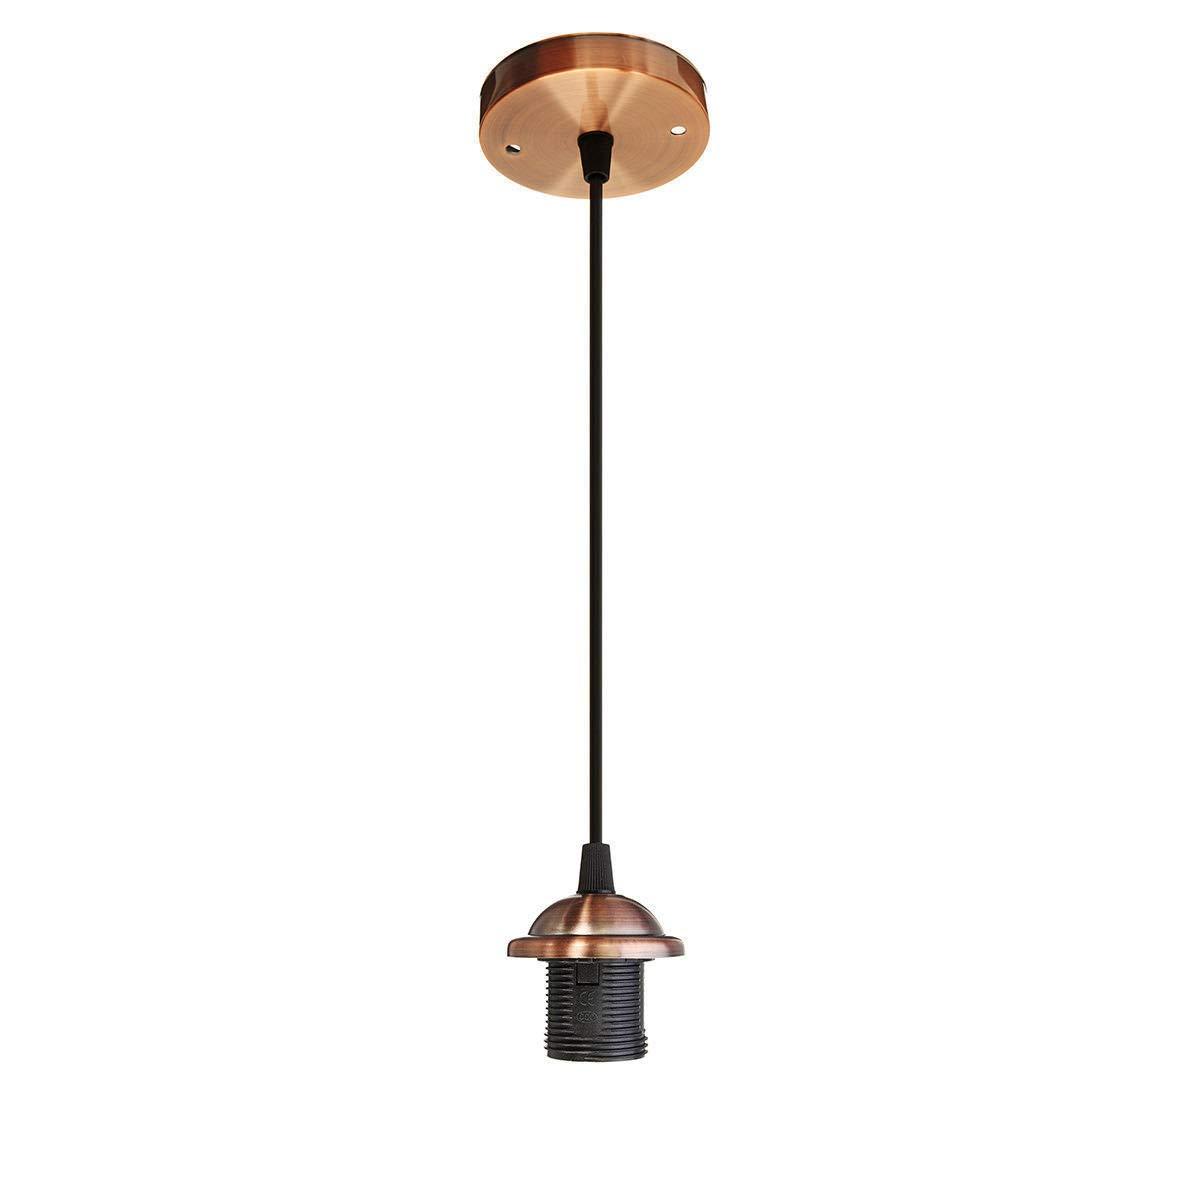 E27 Ceiling Rose Braided Fabric Flex Lamp Holder Light Hanging Fitting Pendant